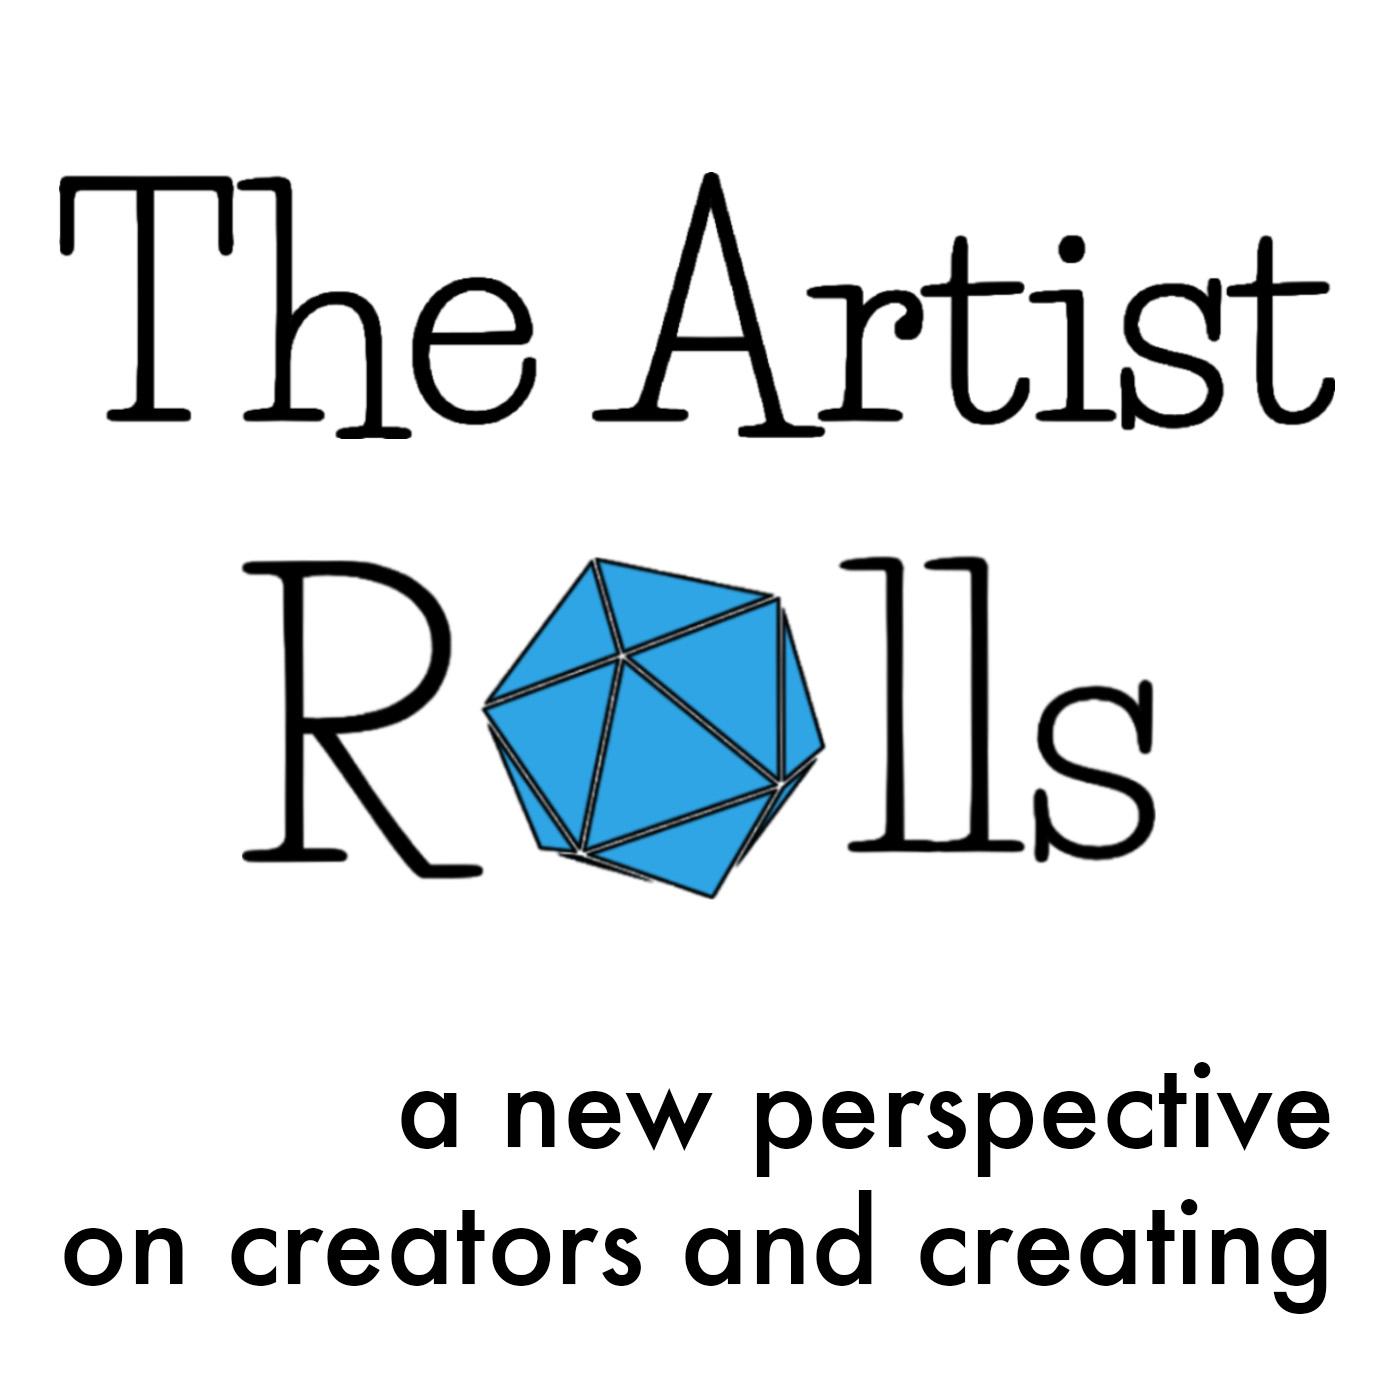 The Artist Rolls